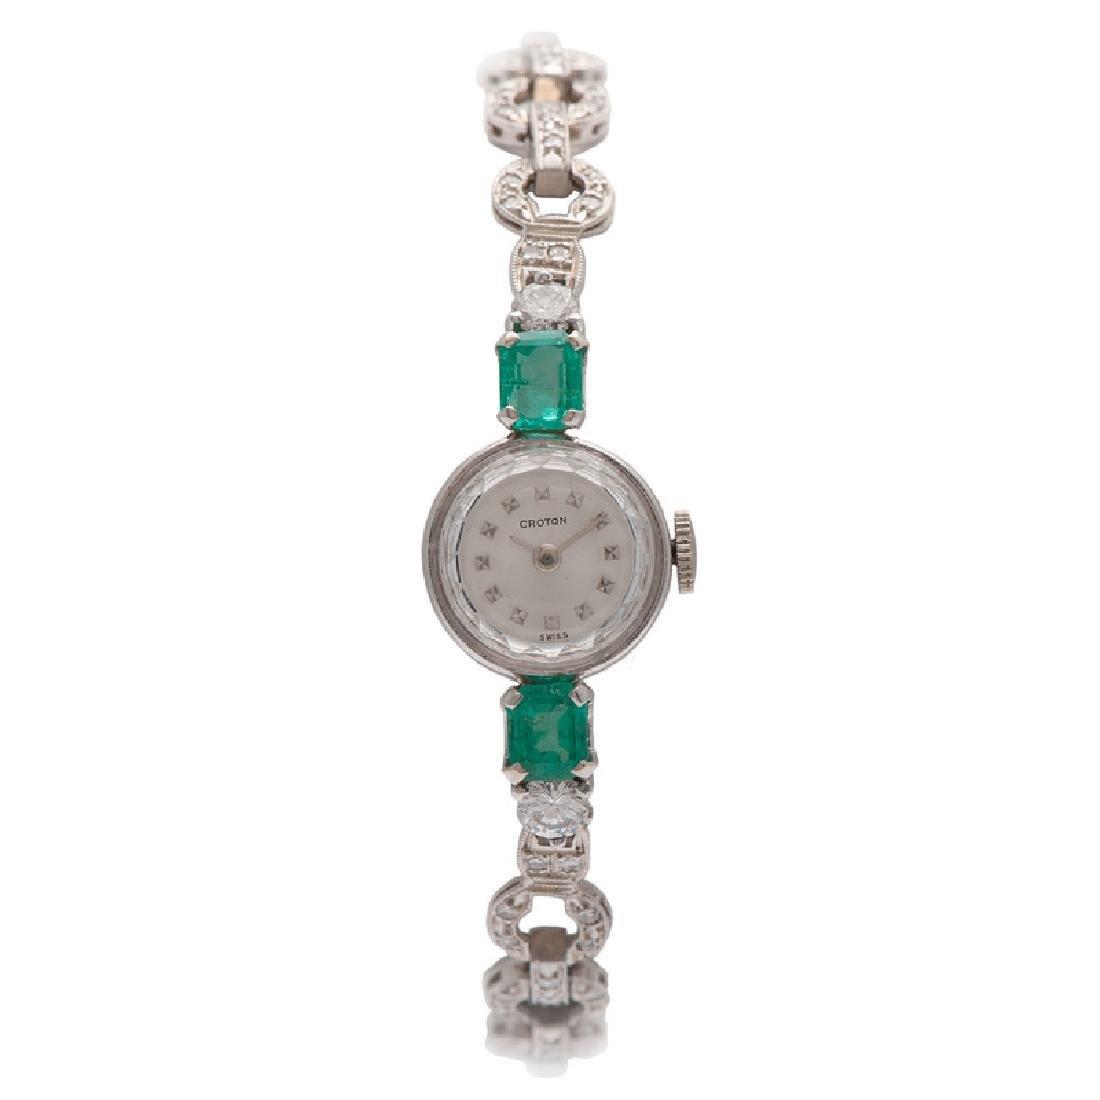 Croton Platinum and White Gold Wrist Watch